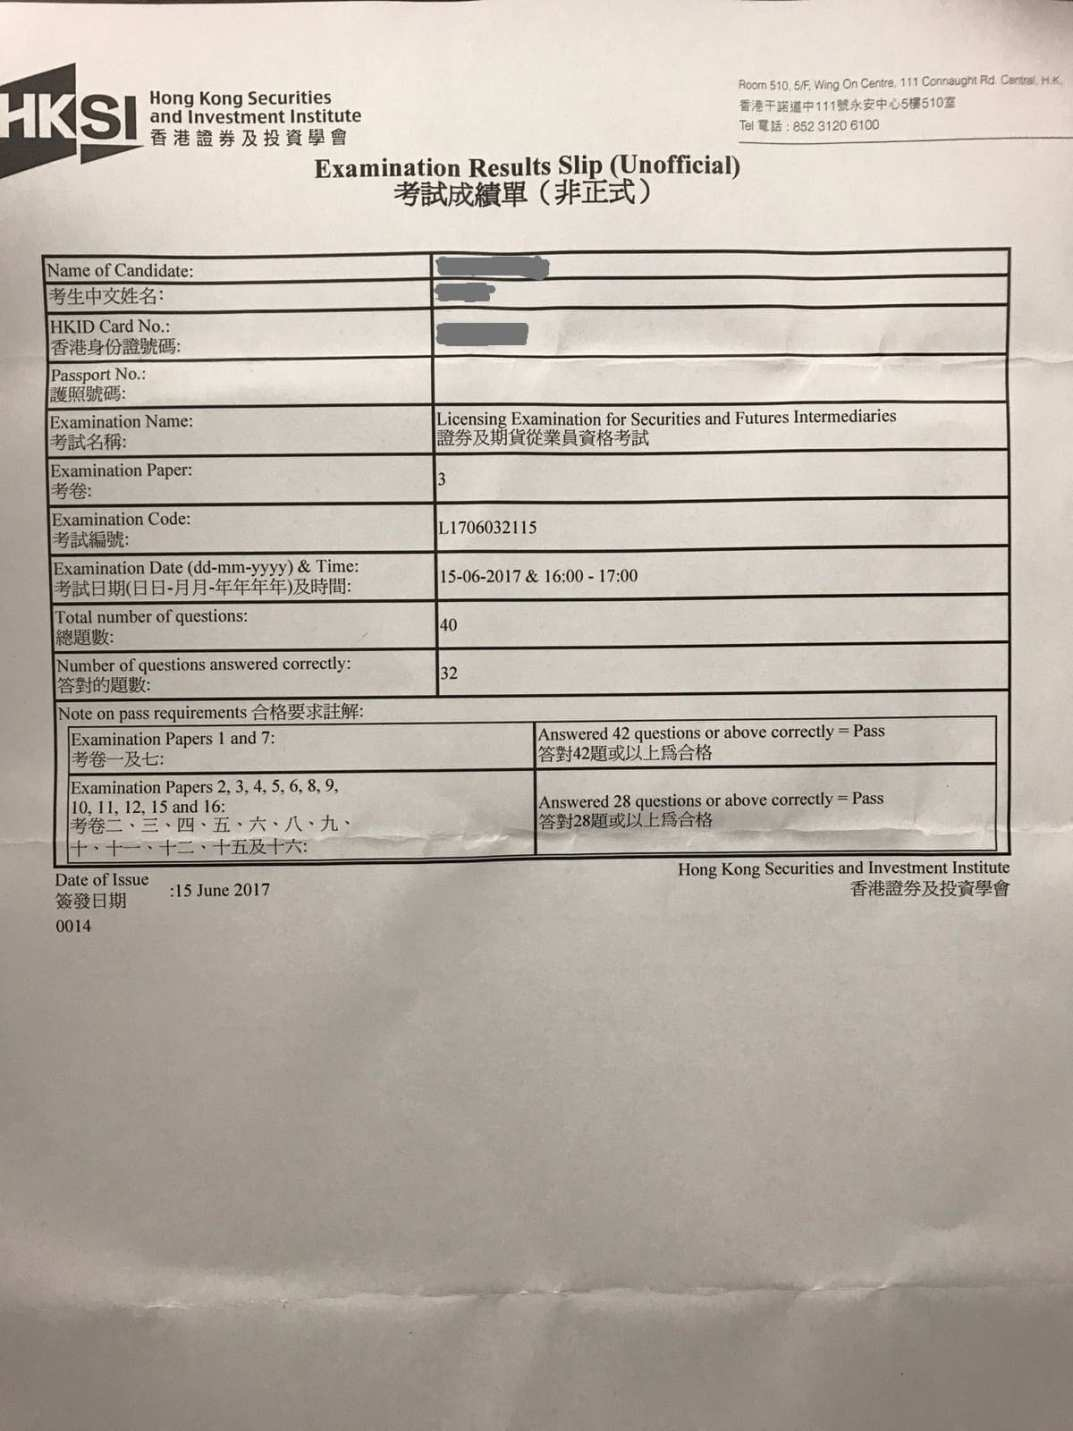 WW 15/6/2017 LE Paper 3 證券期貨從業員資格考試卷三 Pass